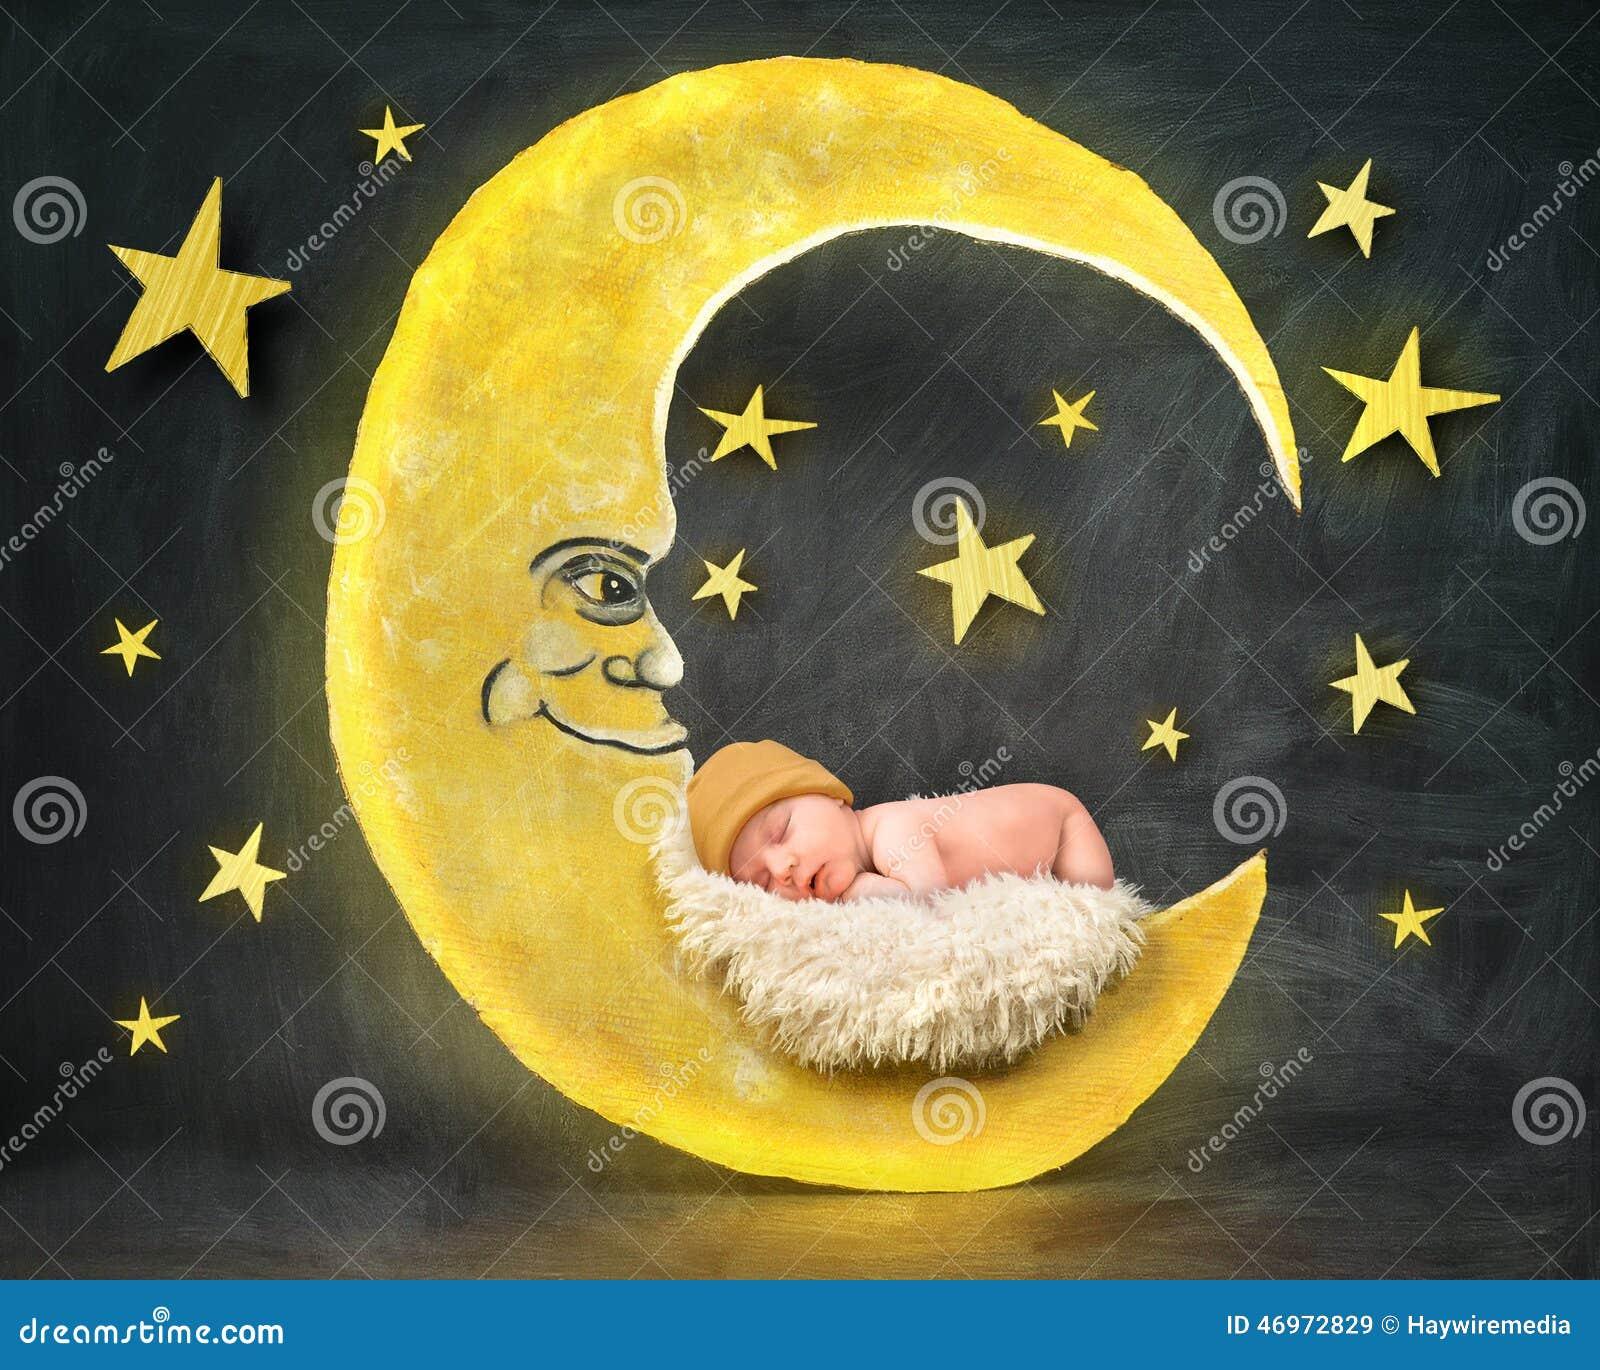 Baby Star Night Light